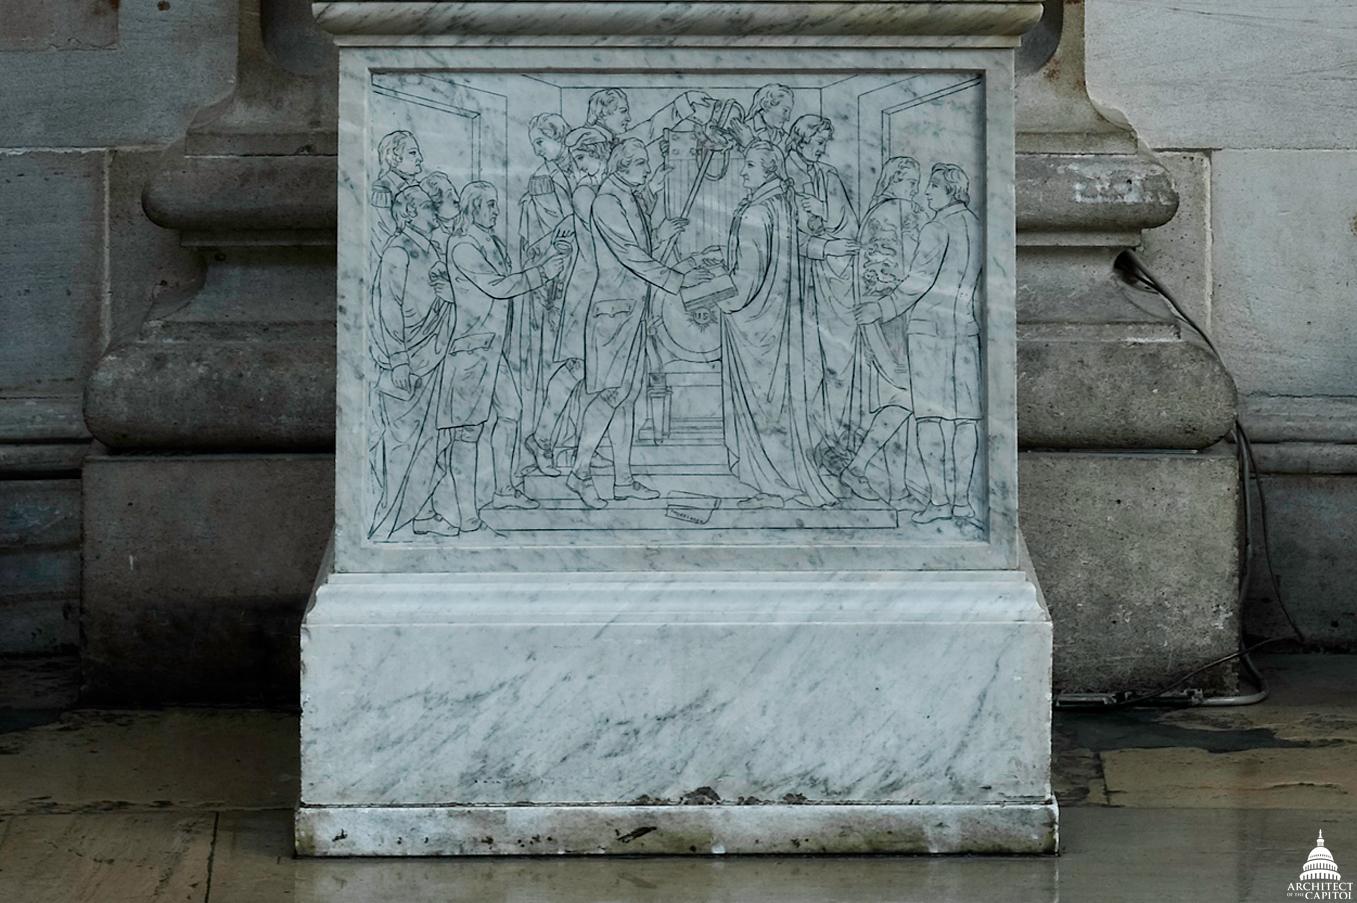 Alexander Hamilton's statue features a unique pedestal depicting the inauguration of George Washington.